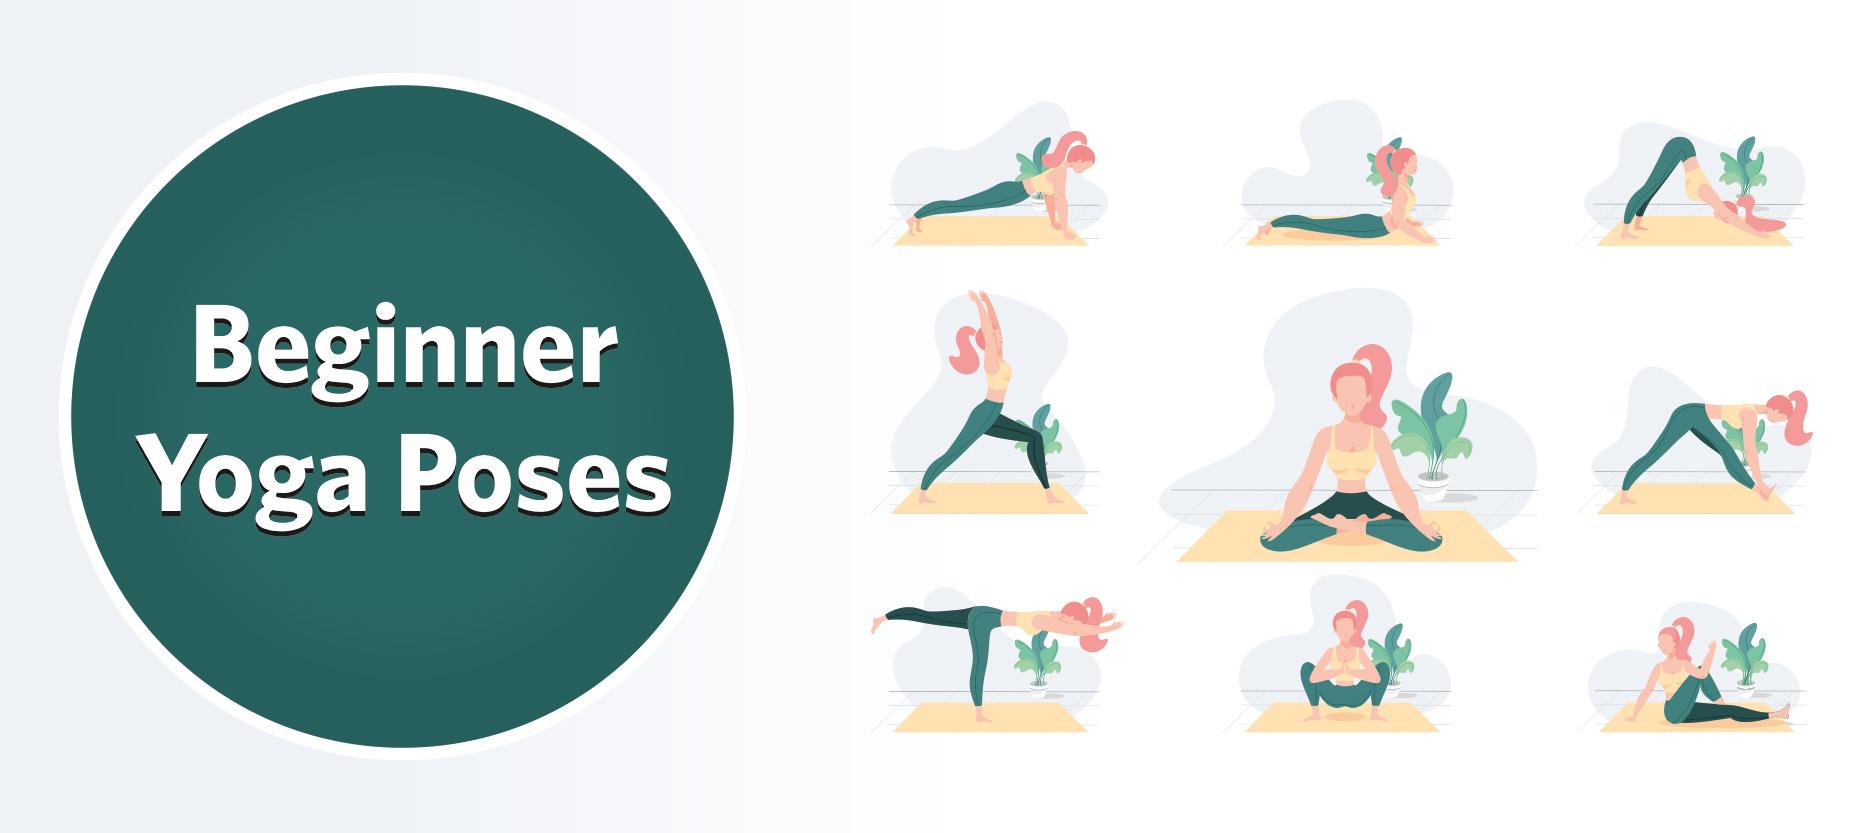 Basic Yoga Asanas for Beginners: Benefits and Contraindications